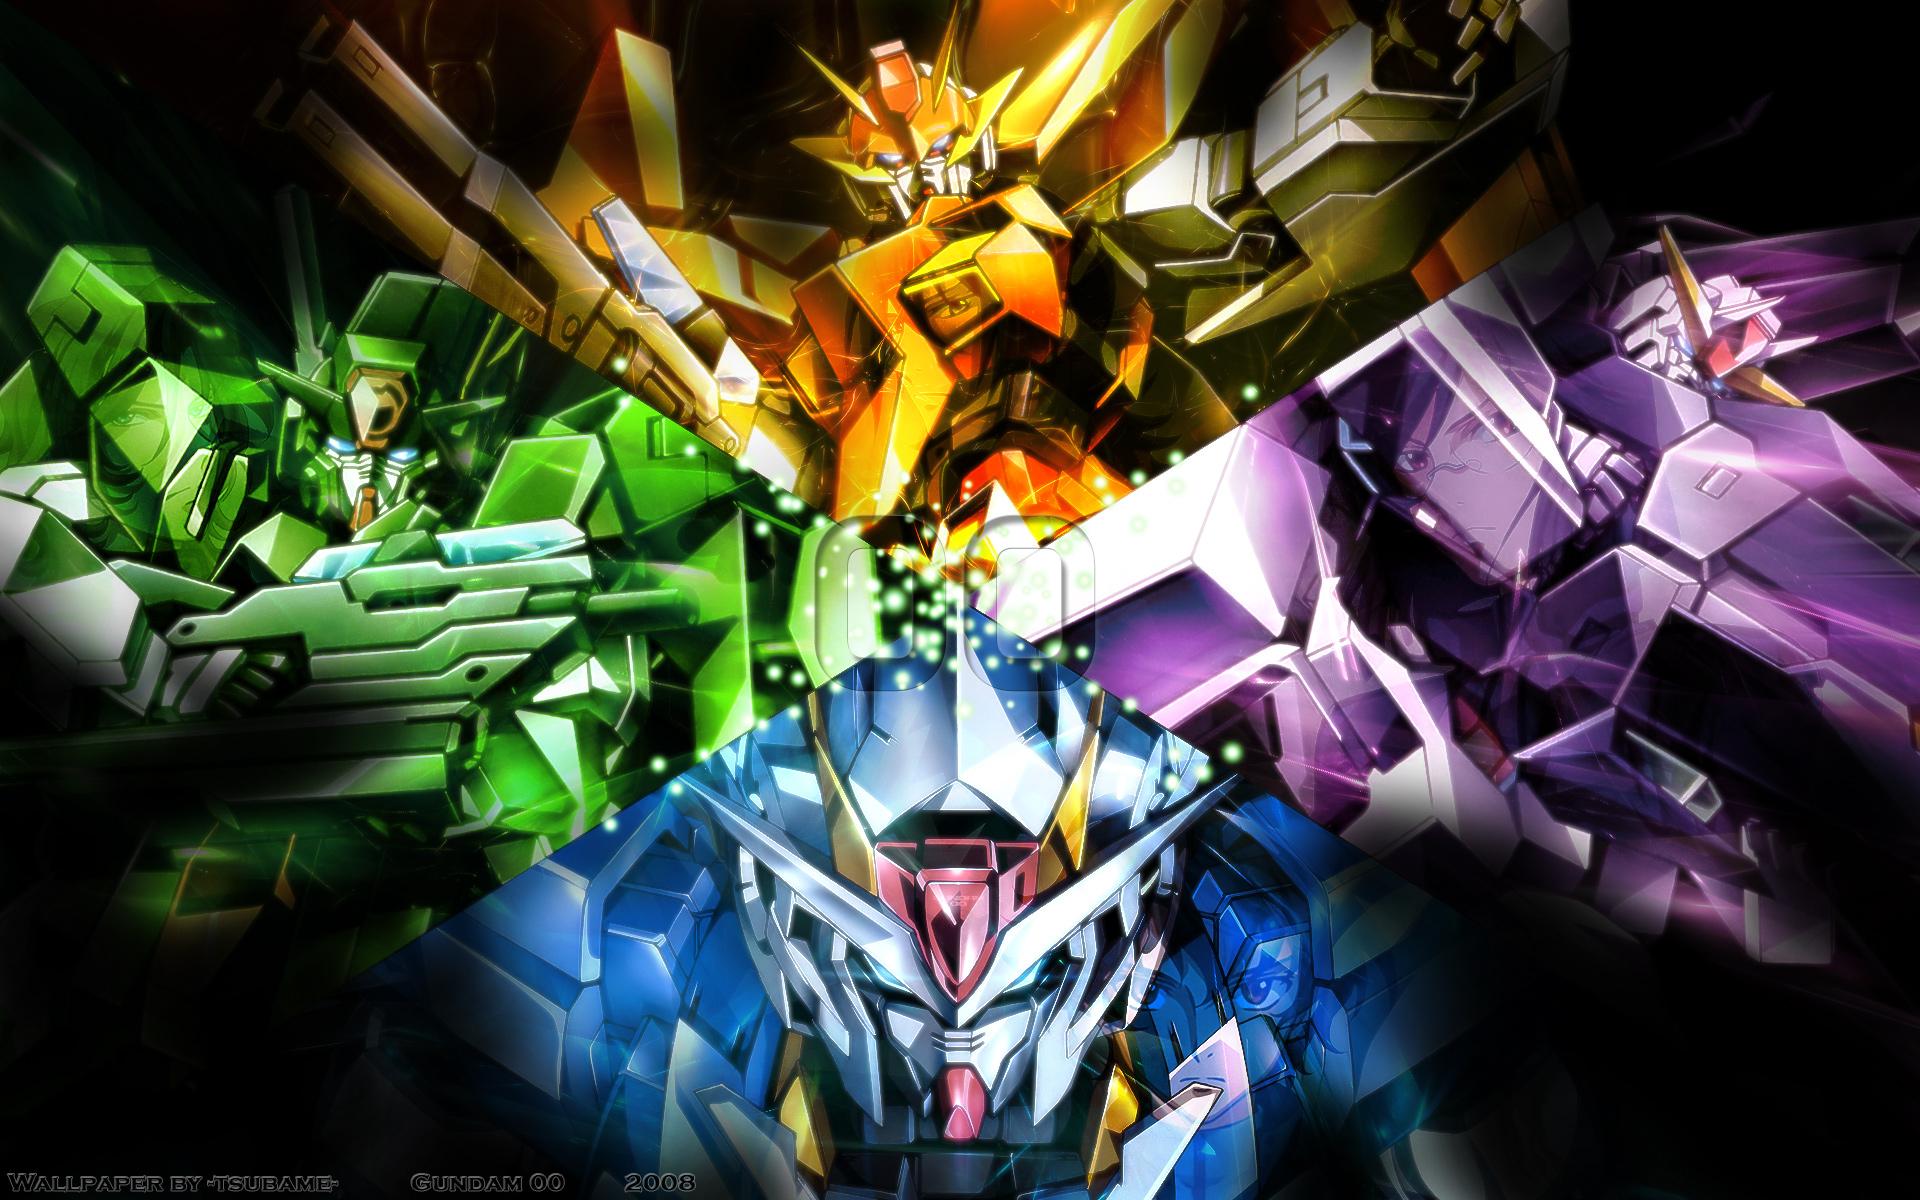 Gundam 00 Wallpapers HD wallpapers   Mobile Suit Gundam 00 Wallpapers 1920x1200